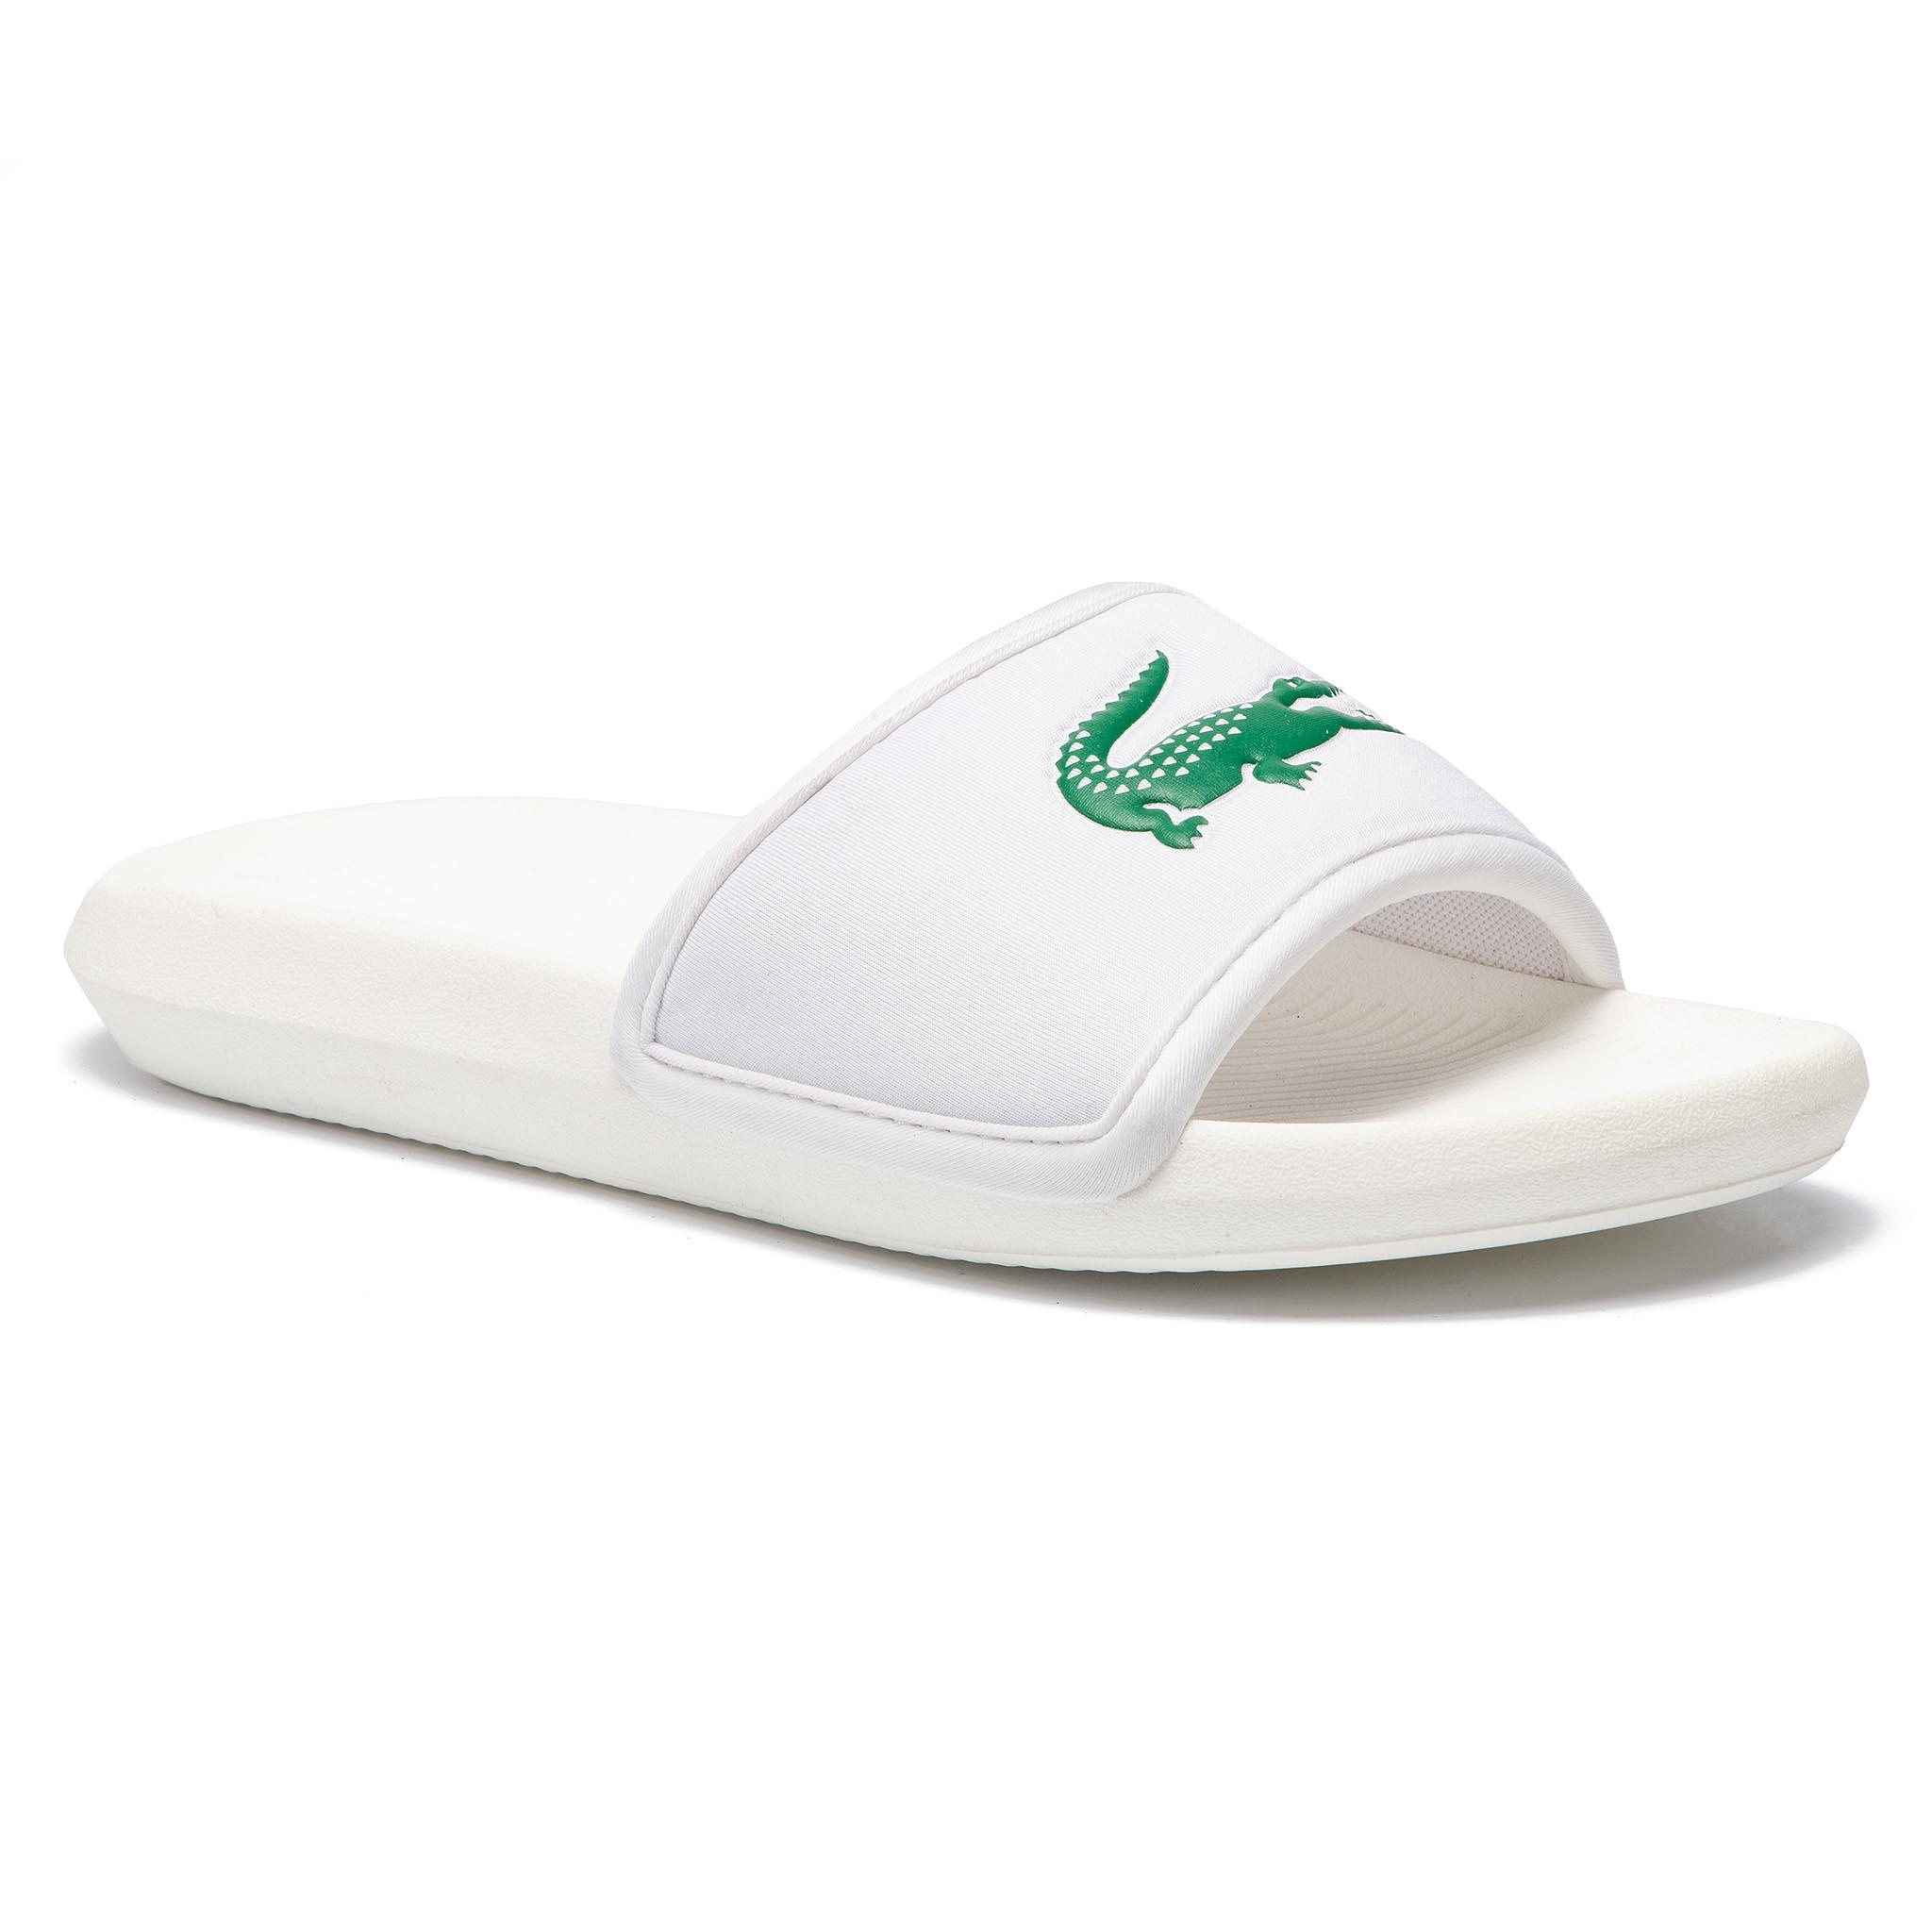 d54595d92db9 Slides LACOSTE - Croco Slide 119 1 Cma 7-37CMA00181R7 Green White ...